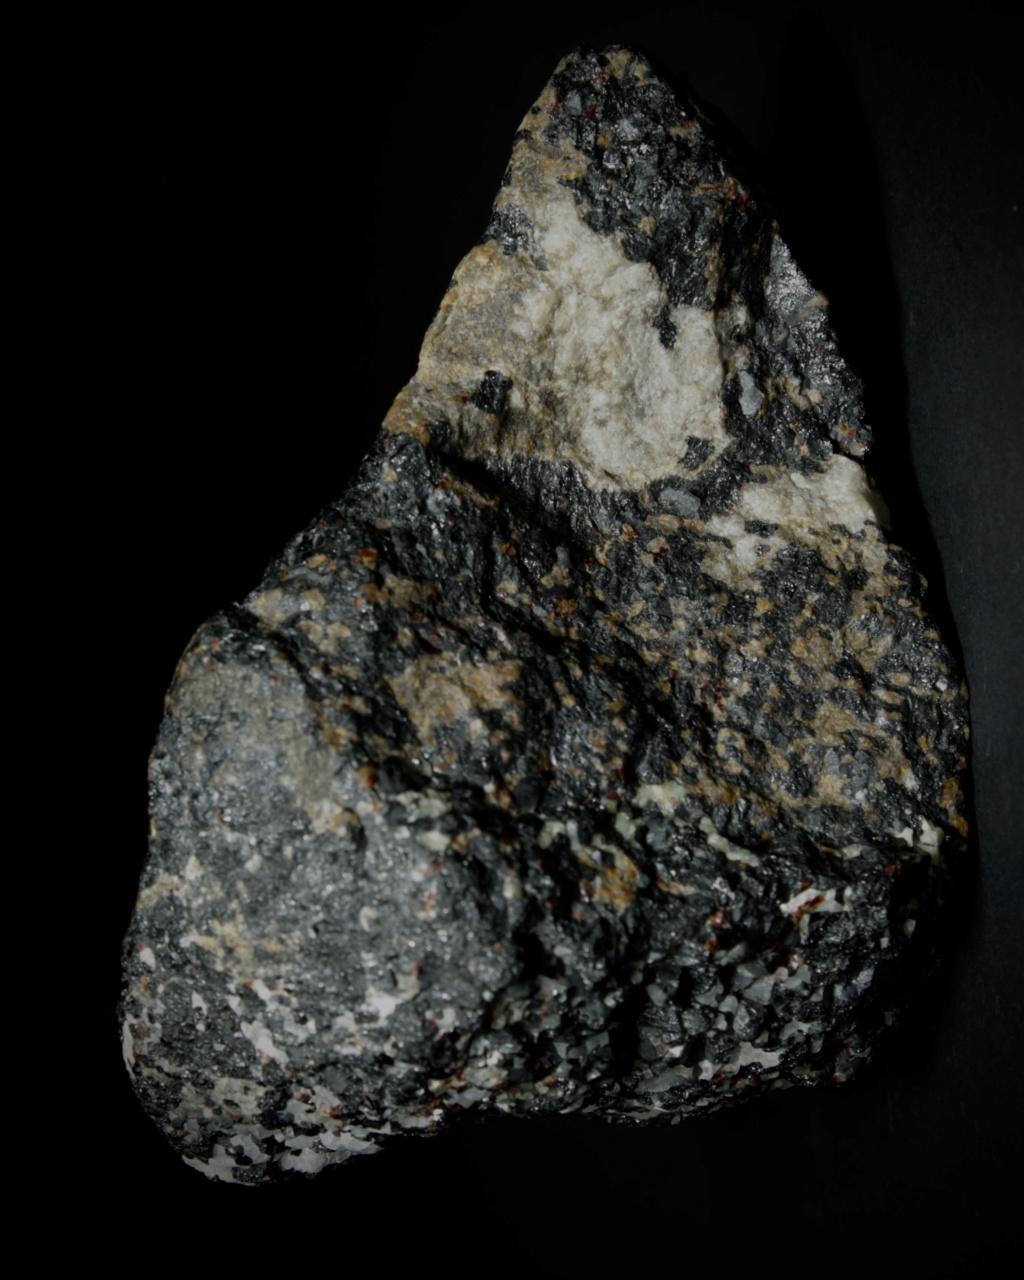 Colección de Minerales Fluorescentes - Página 5 Fullsi19